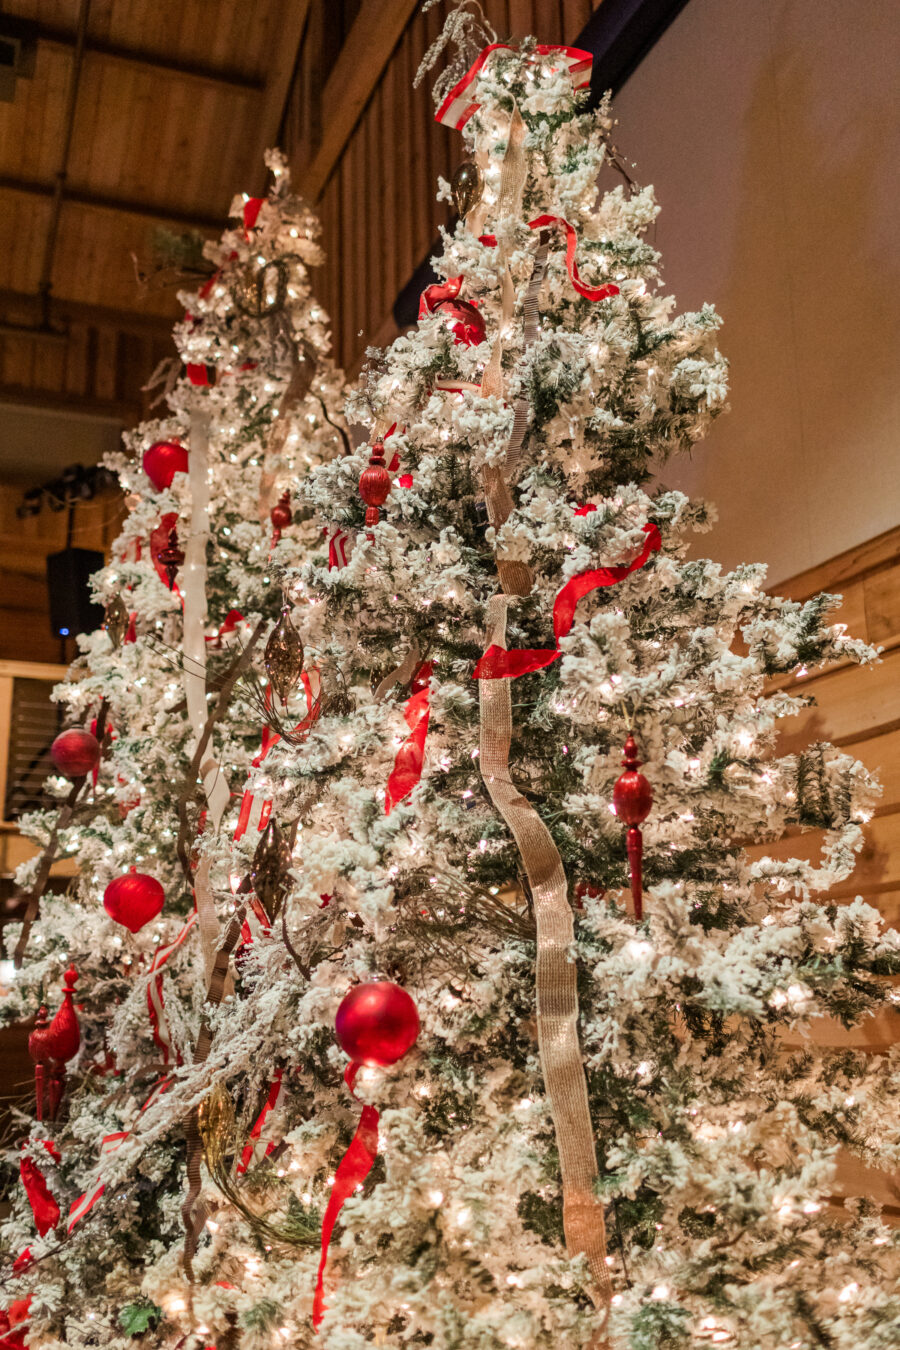 Christmas wedding decor inspiration | Nashville Bride Guide